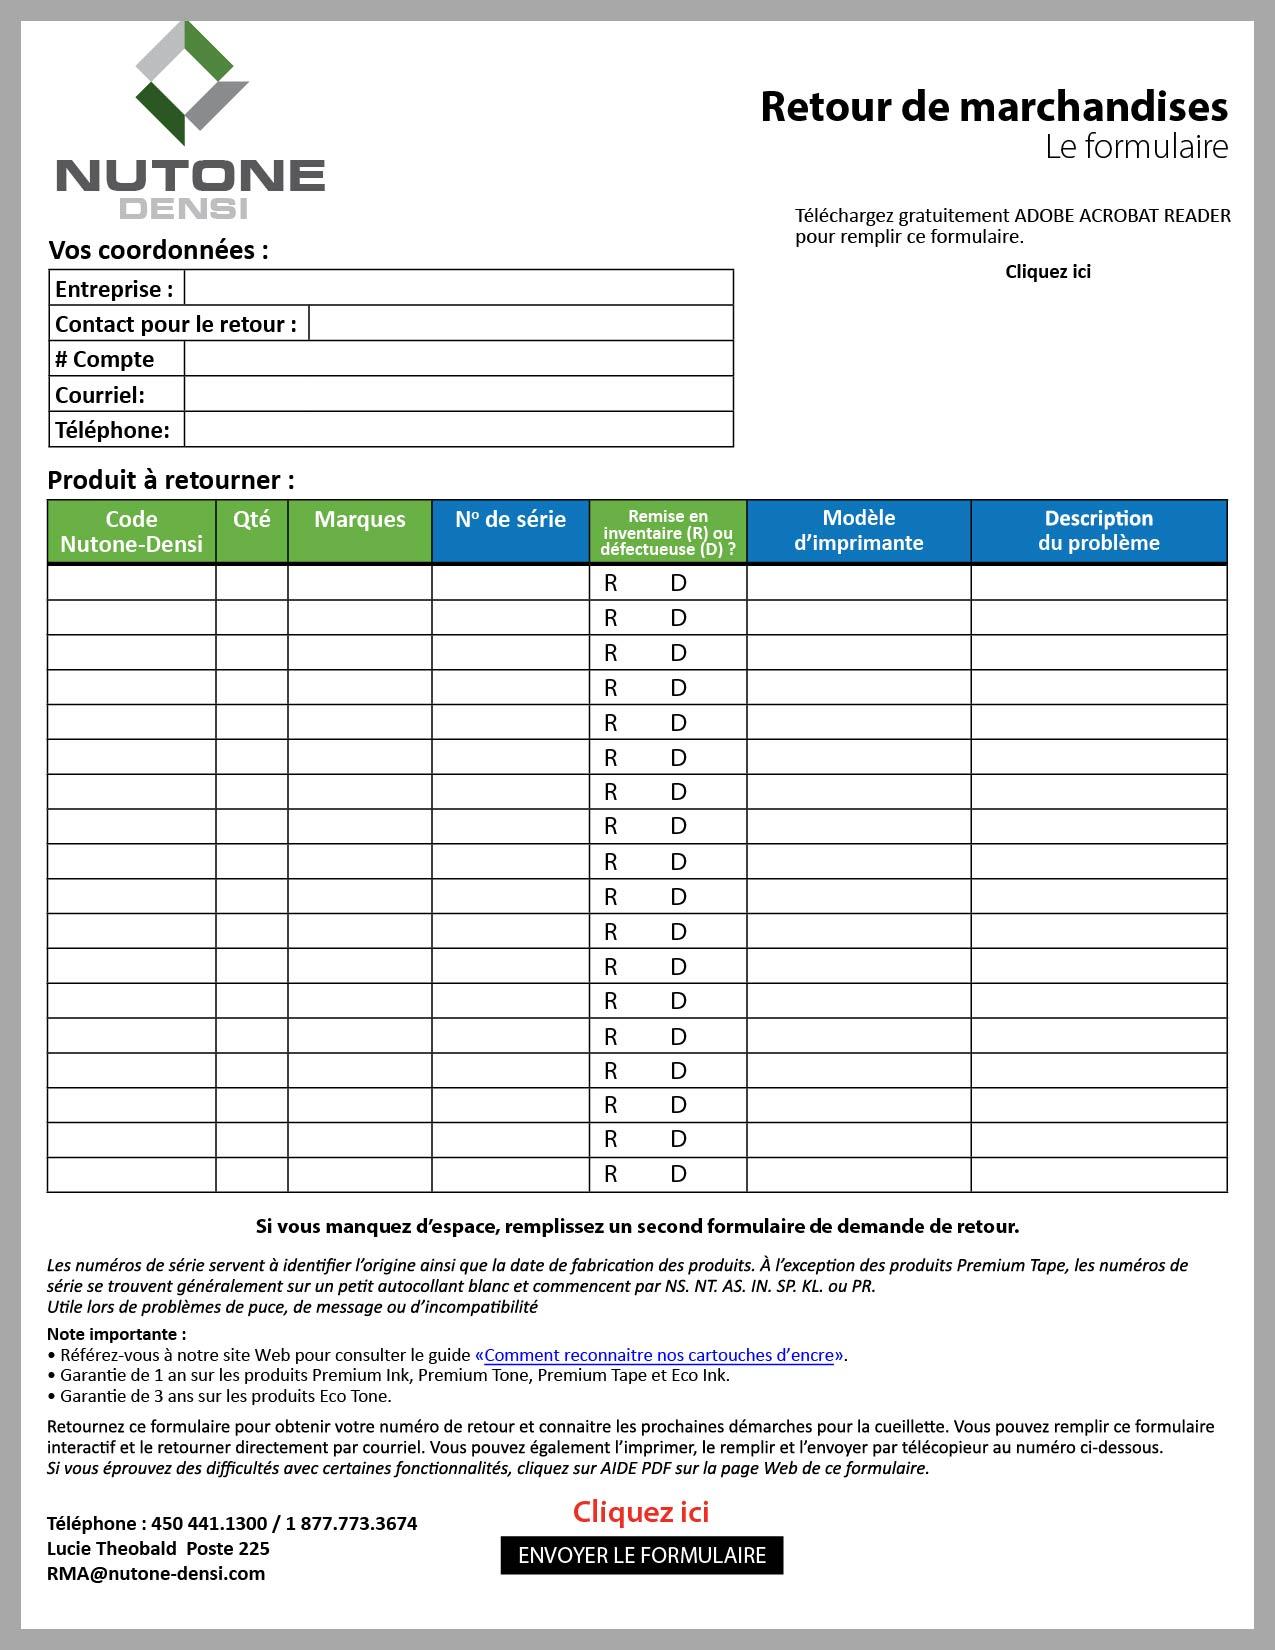 Formulaire_demande_retour_marchandise_nutonedensi_09042021